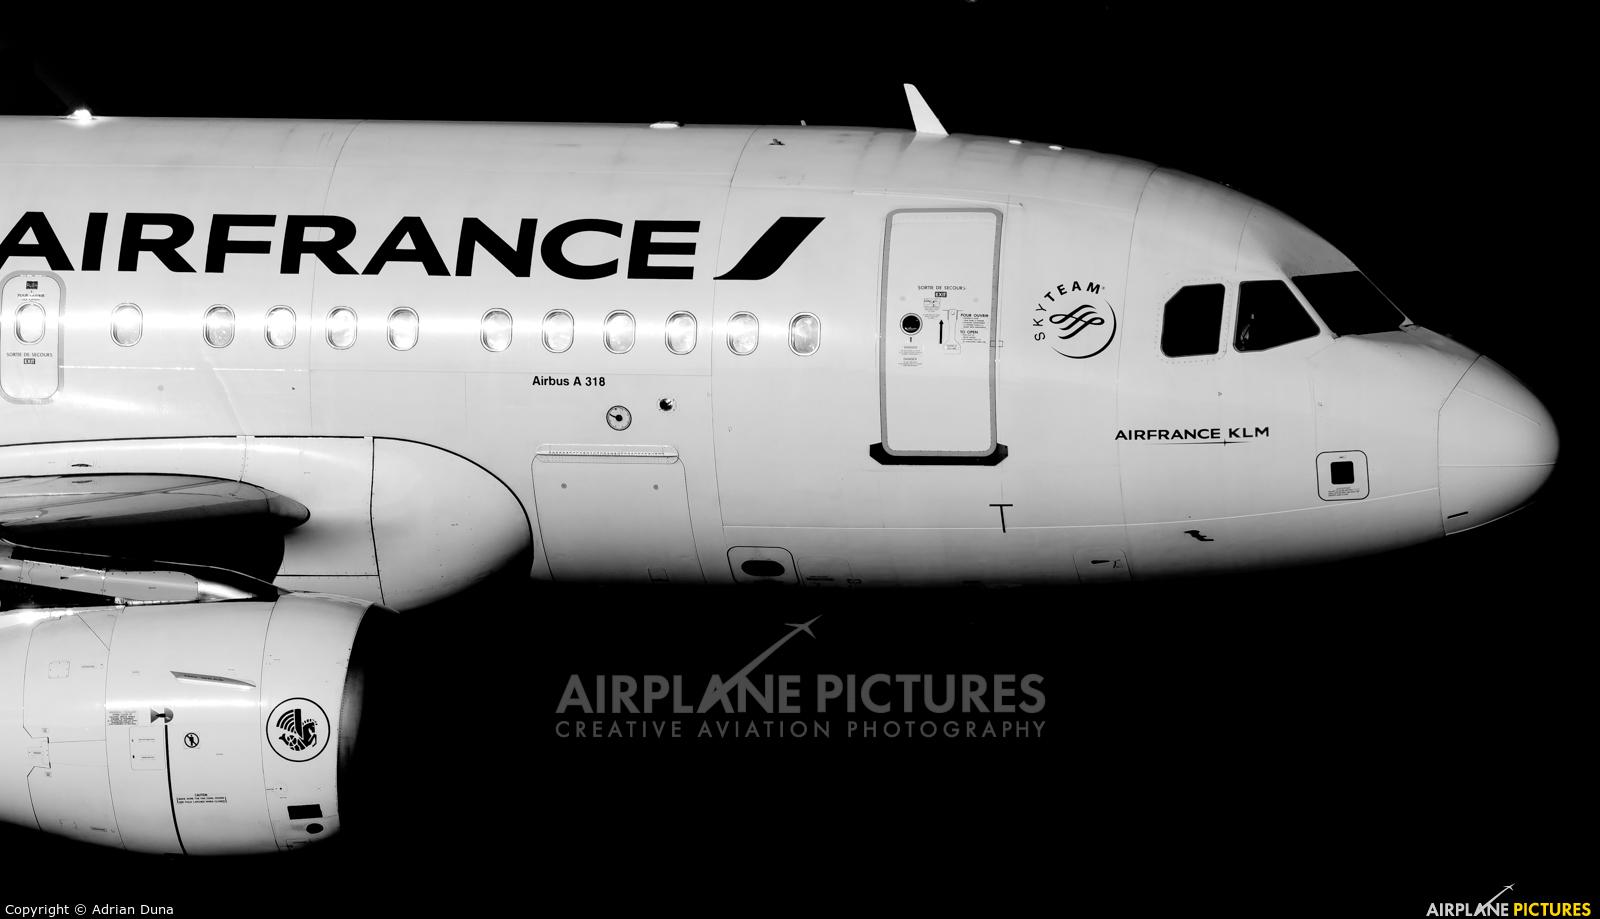 Air France F-GUGN aircraft at Zurich